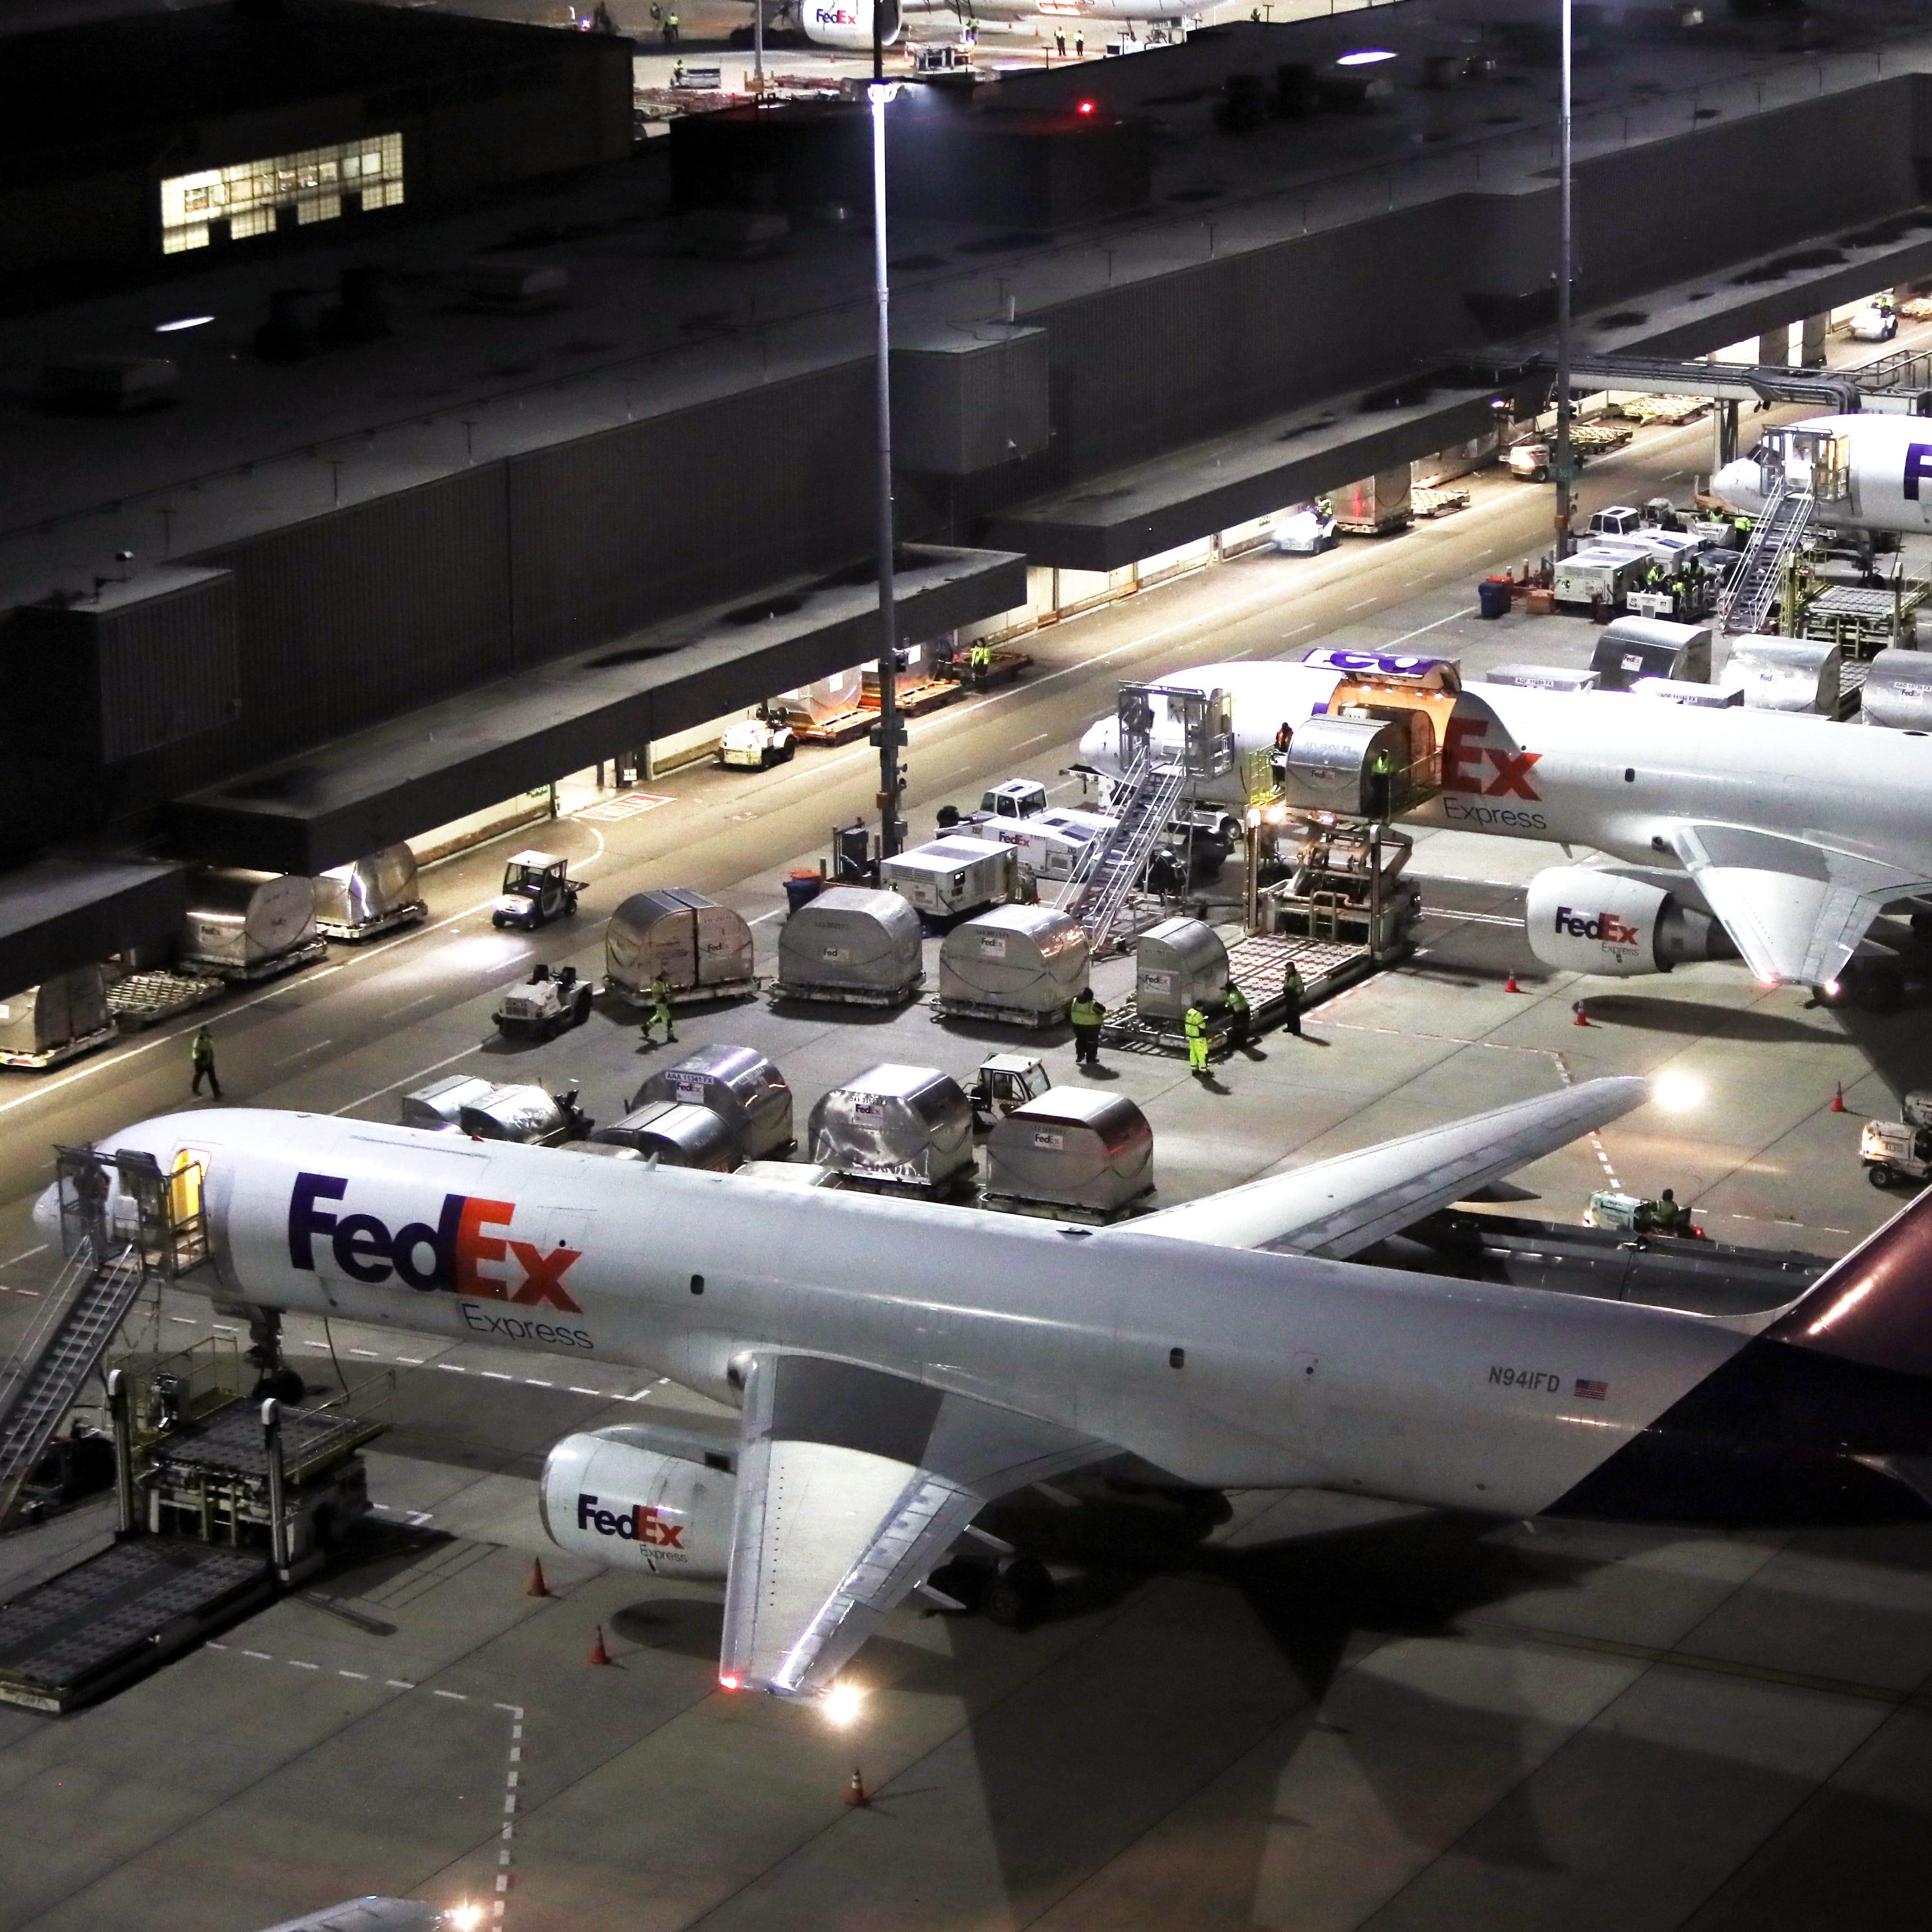 Memphis International Airport grows cargo volume despite U.S. trade tensions